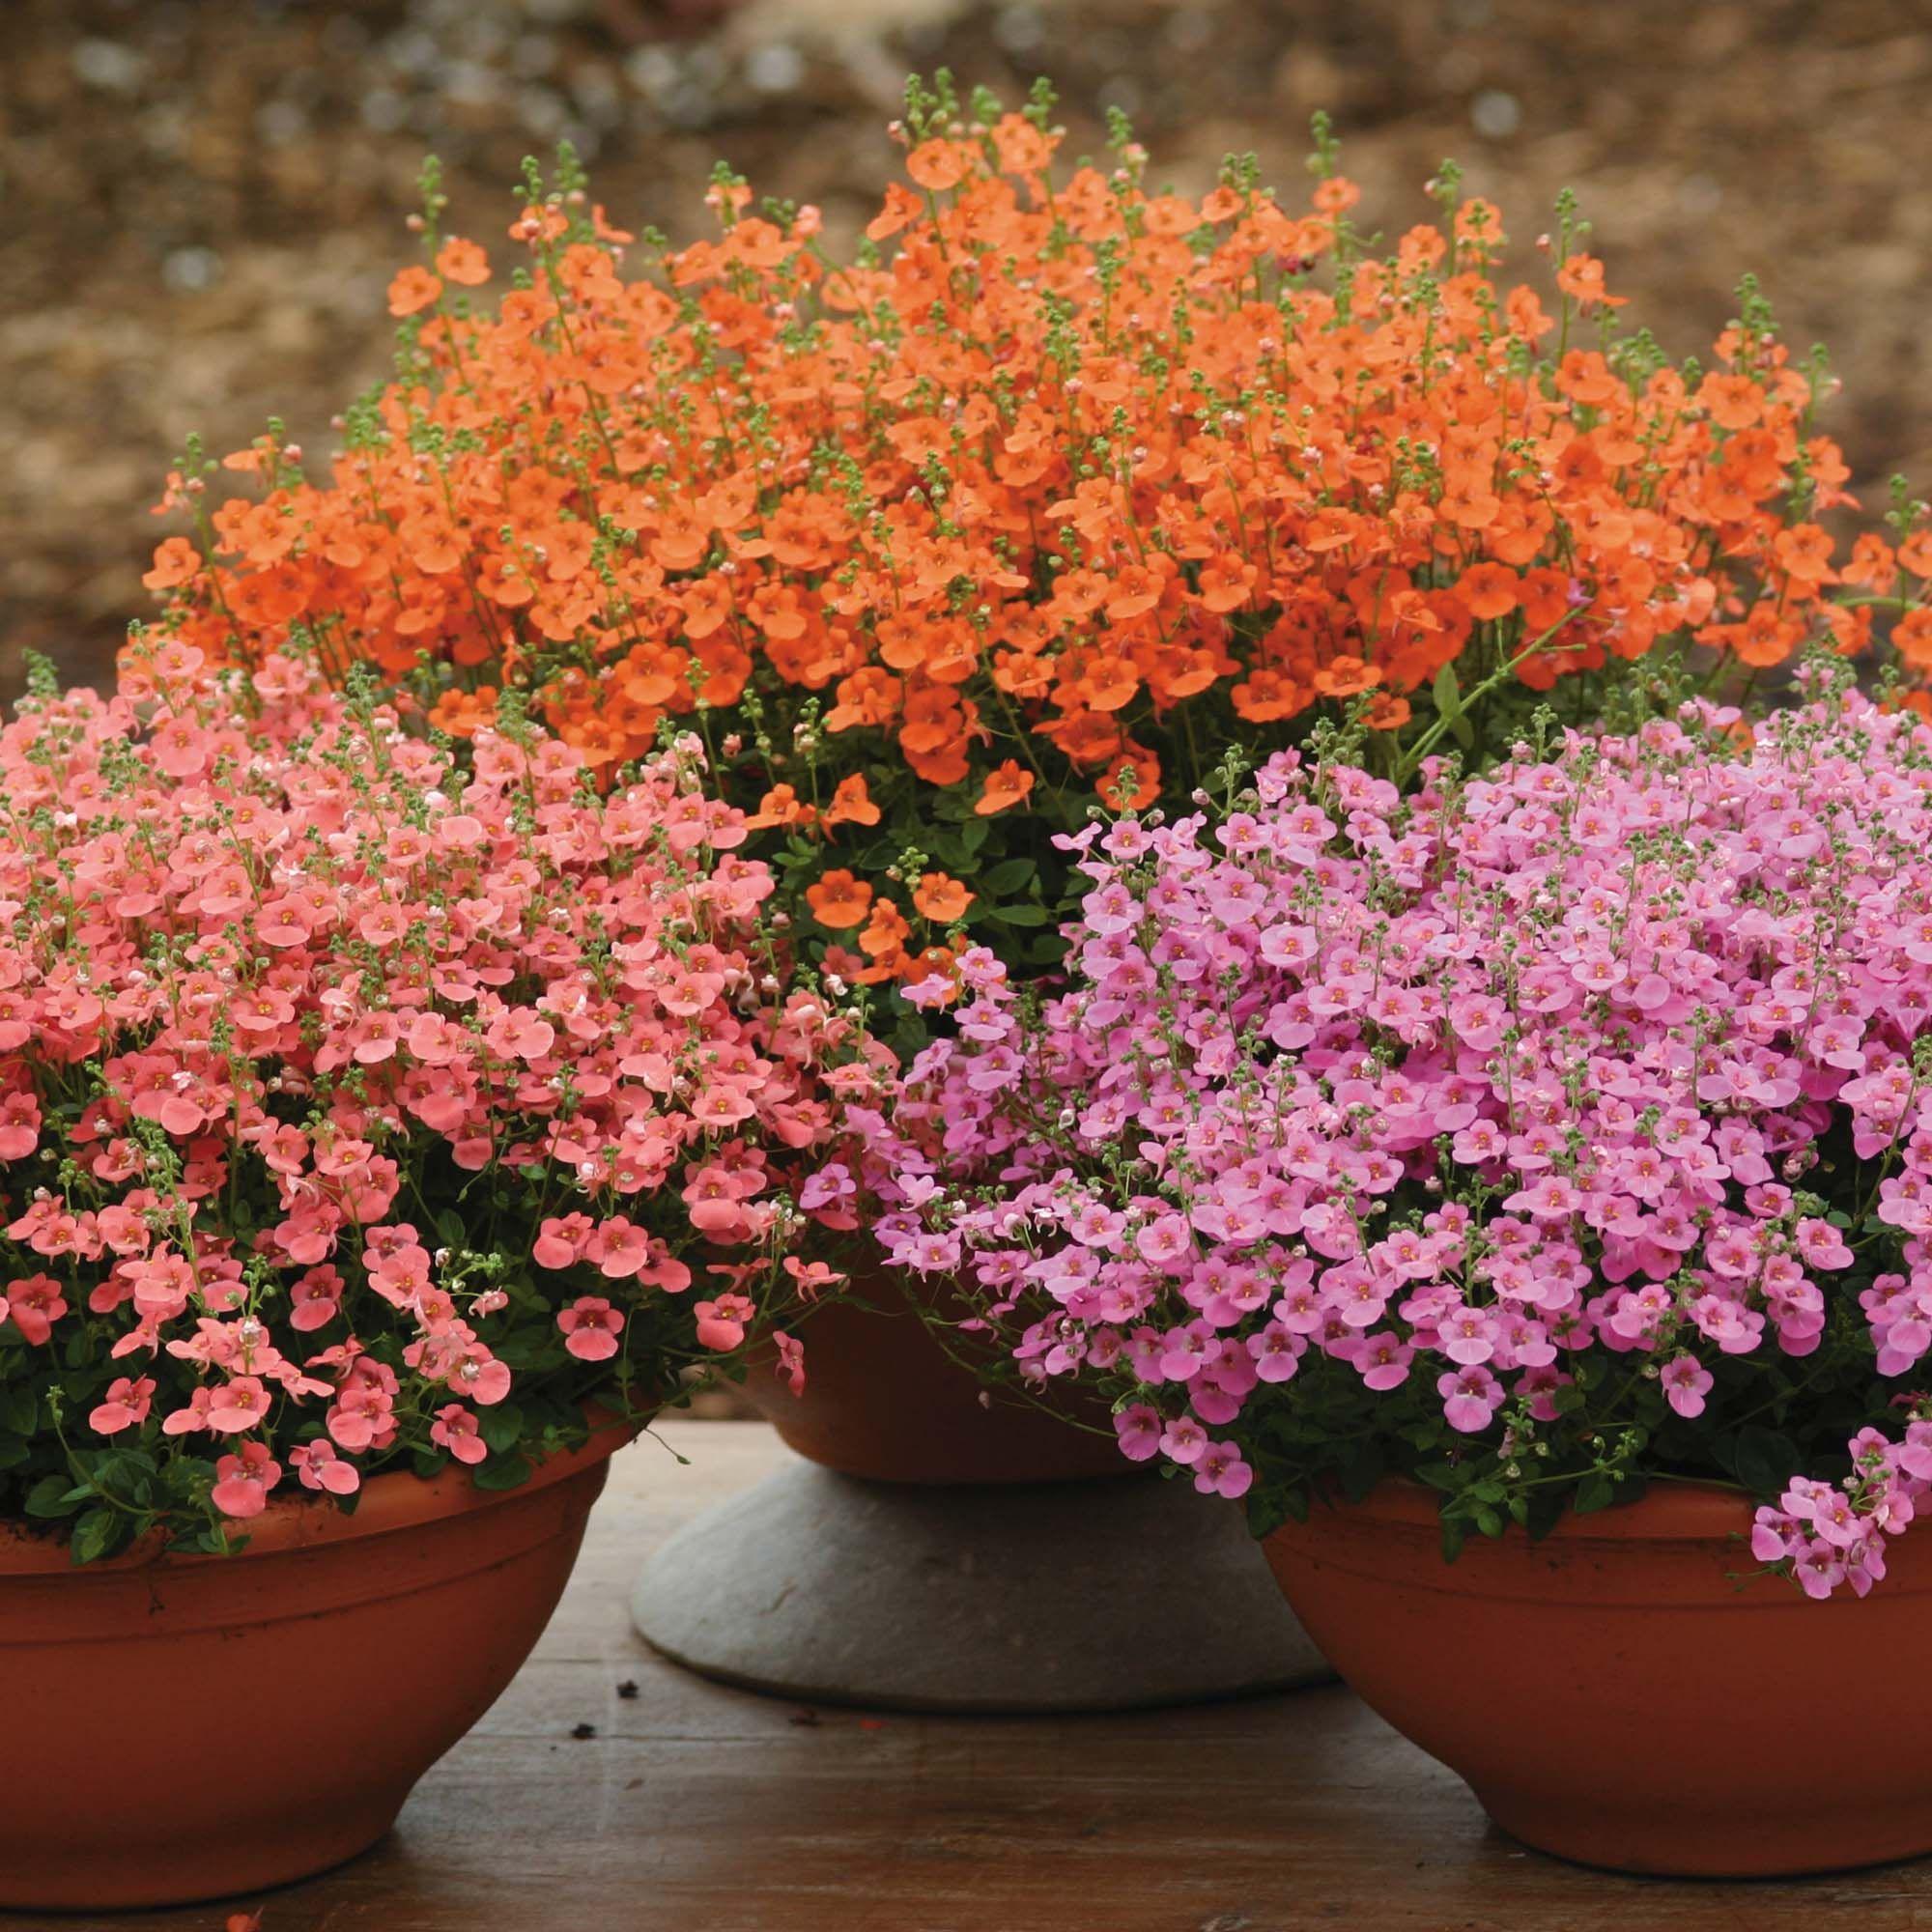 Flower Lobelia Cascade EU Standard Quality Seed Pack For Garden Beds Pots Red